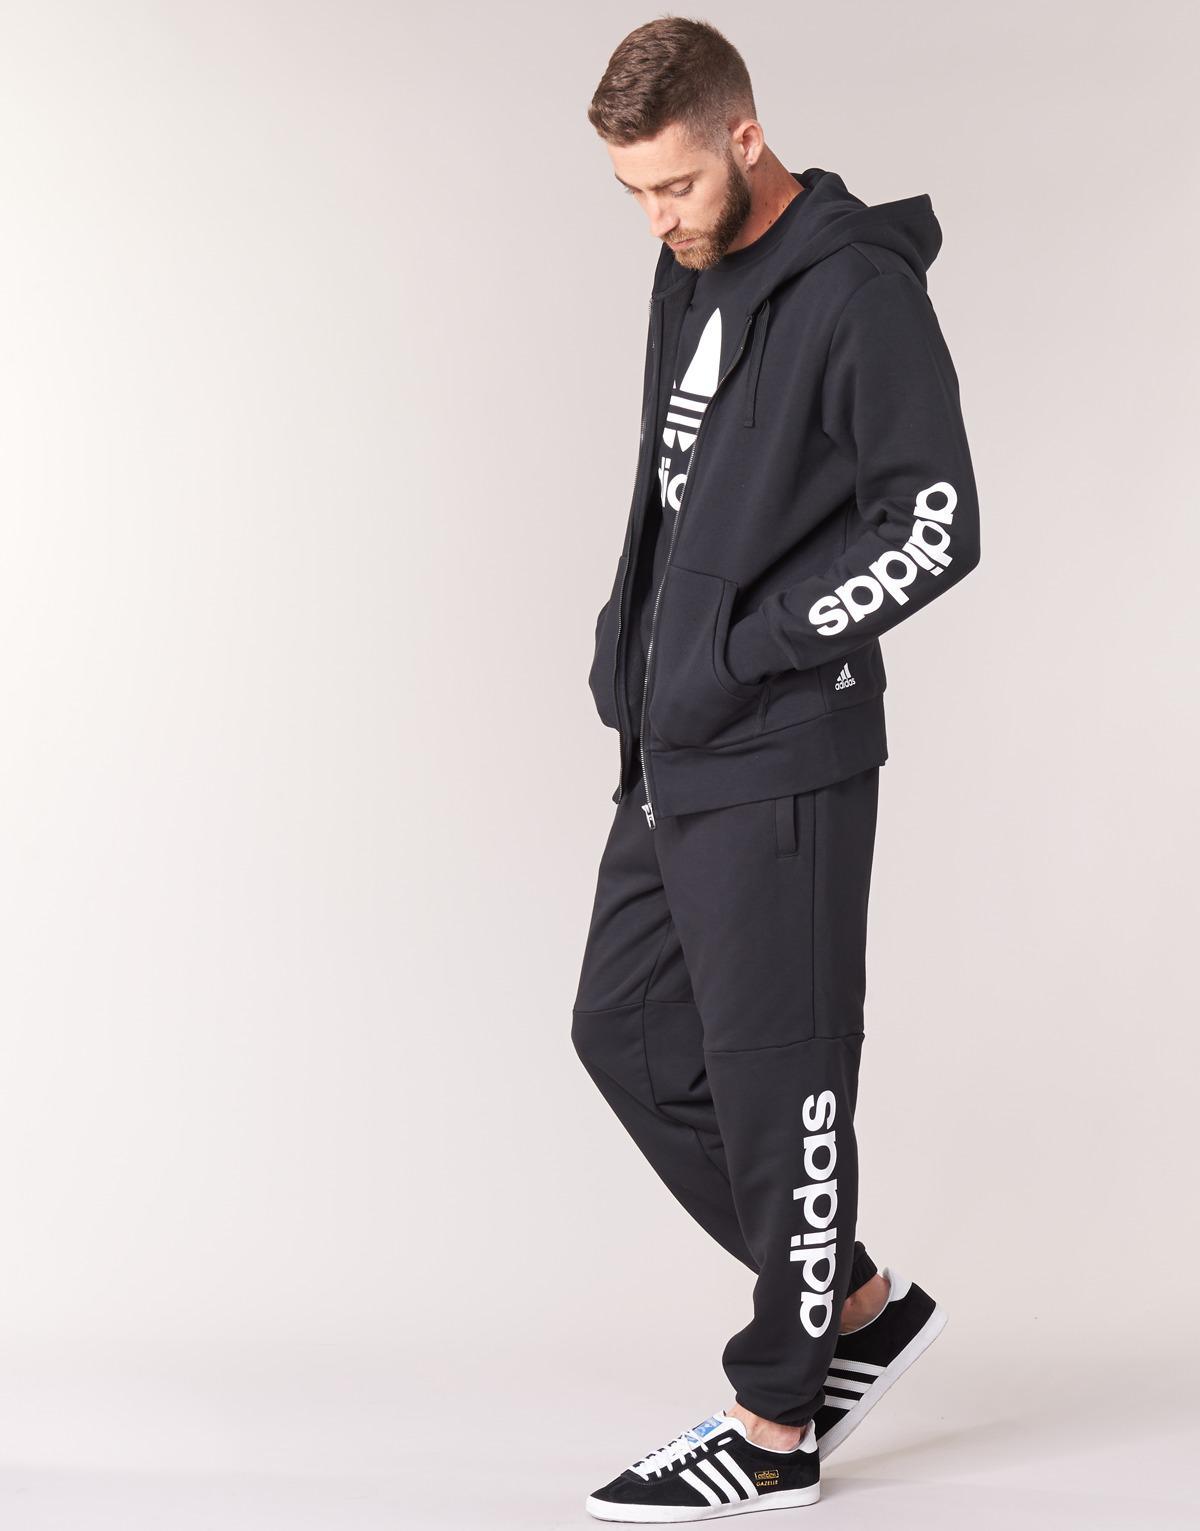 Men's Black Ess Lin Fzhoodb Sweatshirt